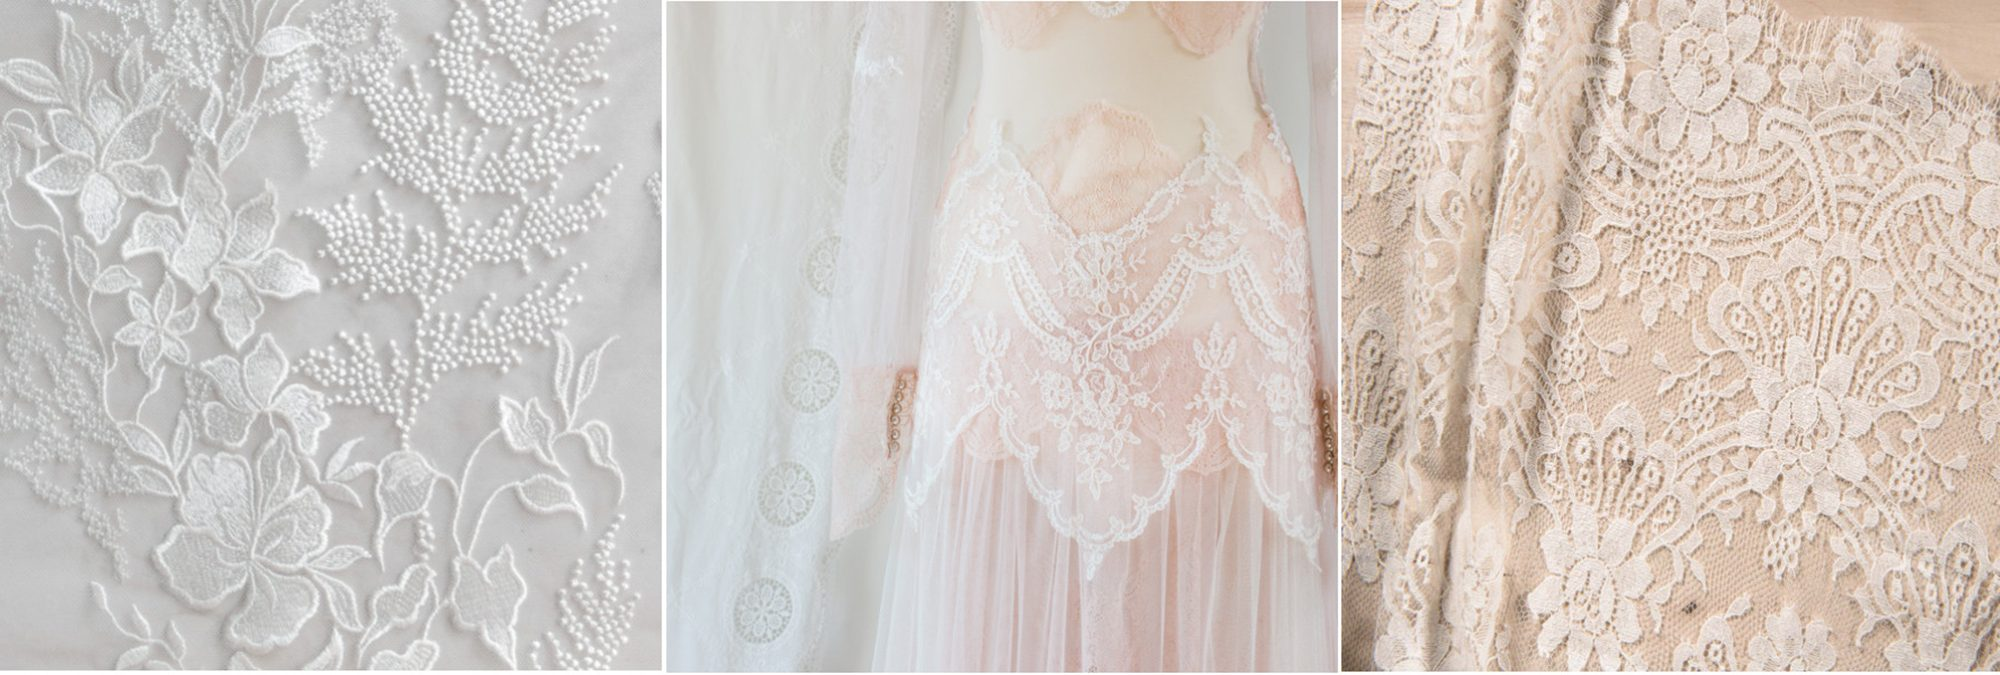 dentelle-robe-mariee